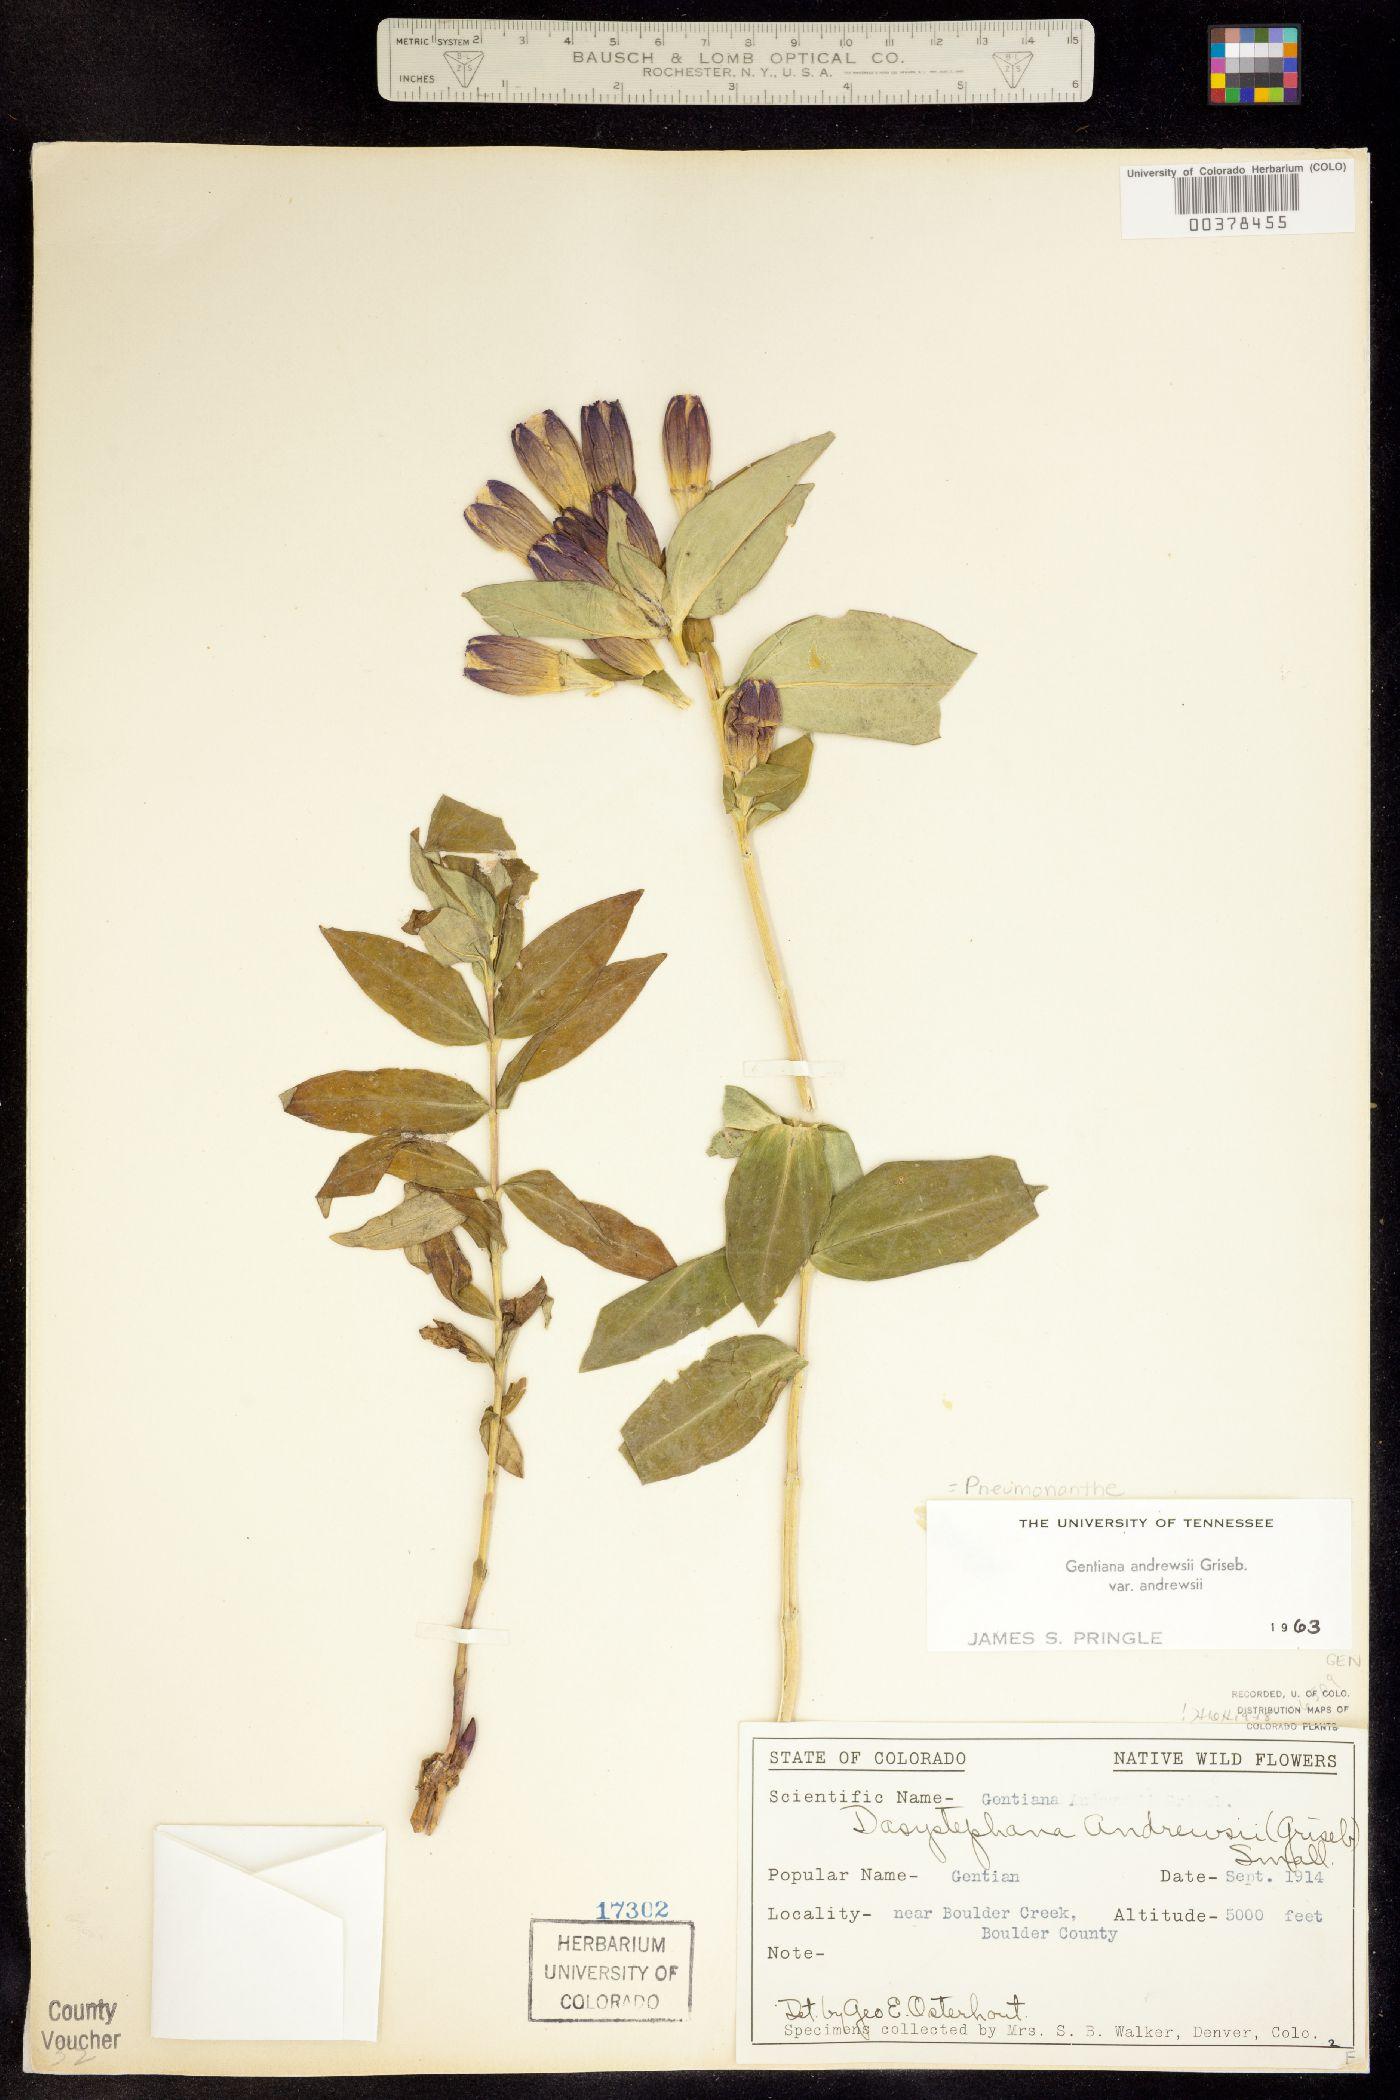 Pneumonanthe andrewsii image